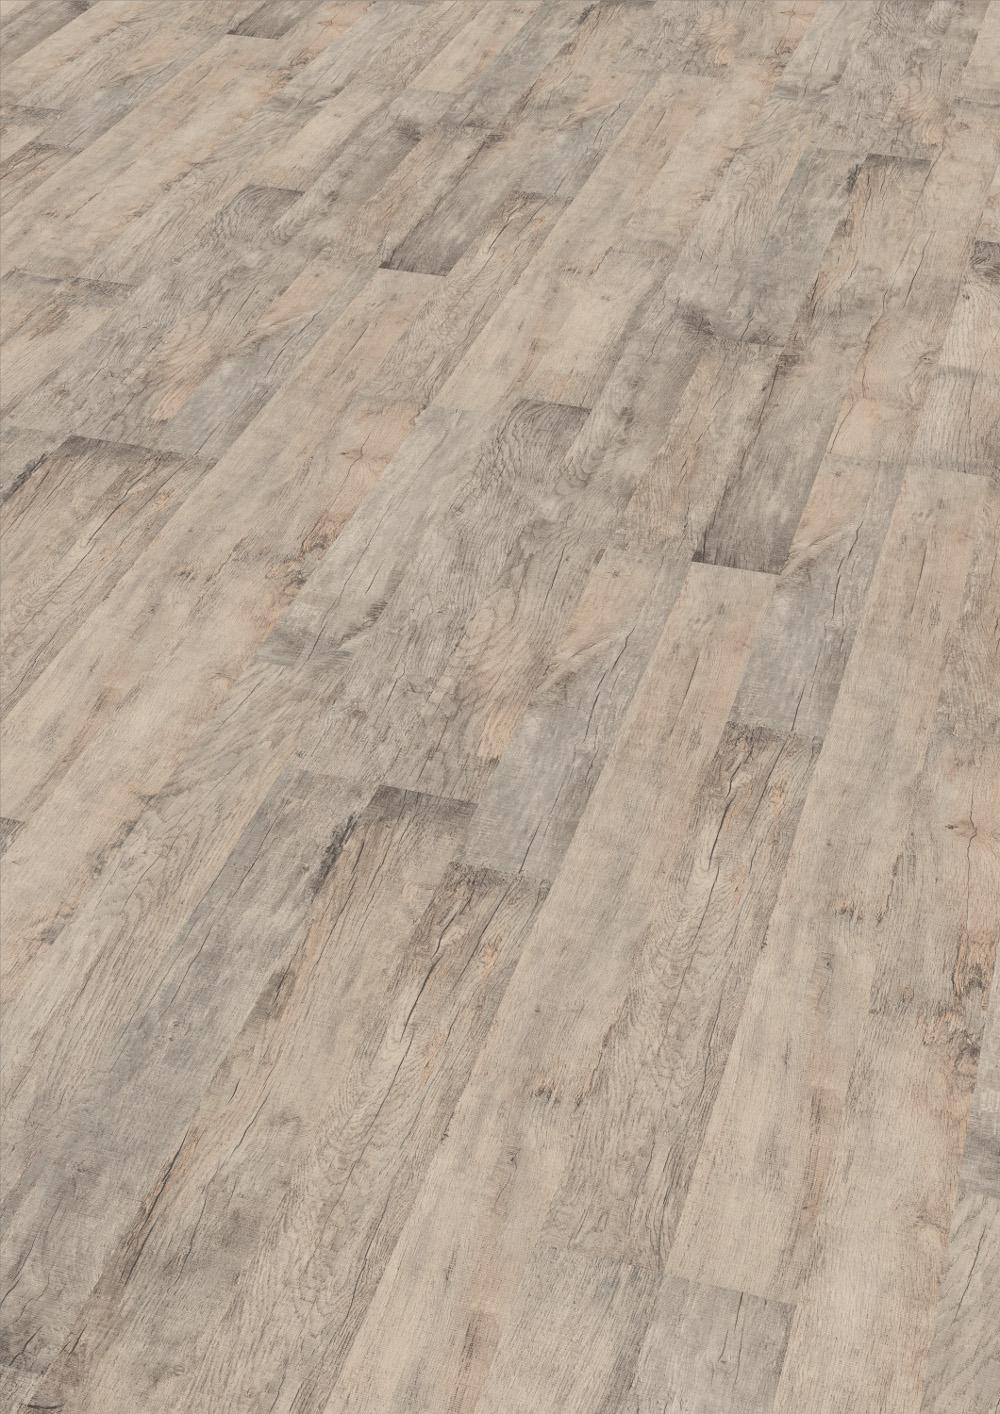 wineo laminat storm oak 2 stab wineo 500 medium. Black Bedroom Furniture Sets. Home Design Ideas